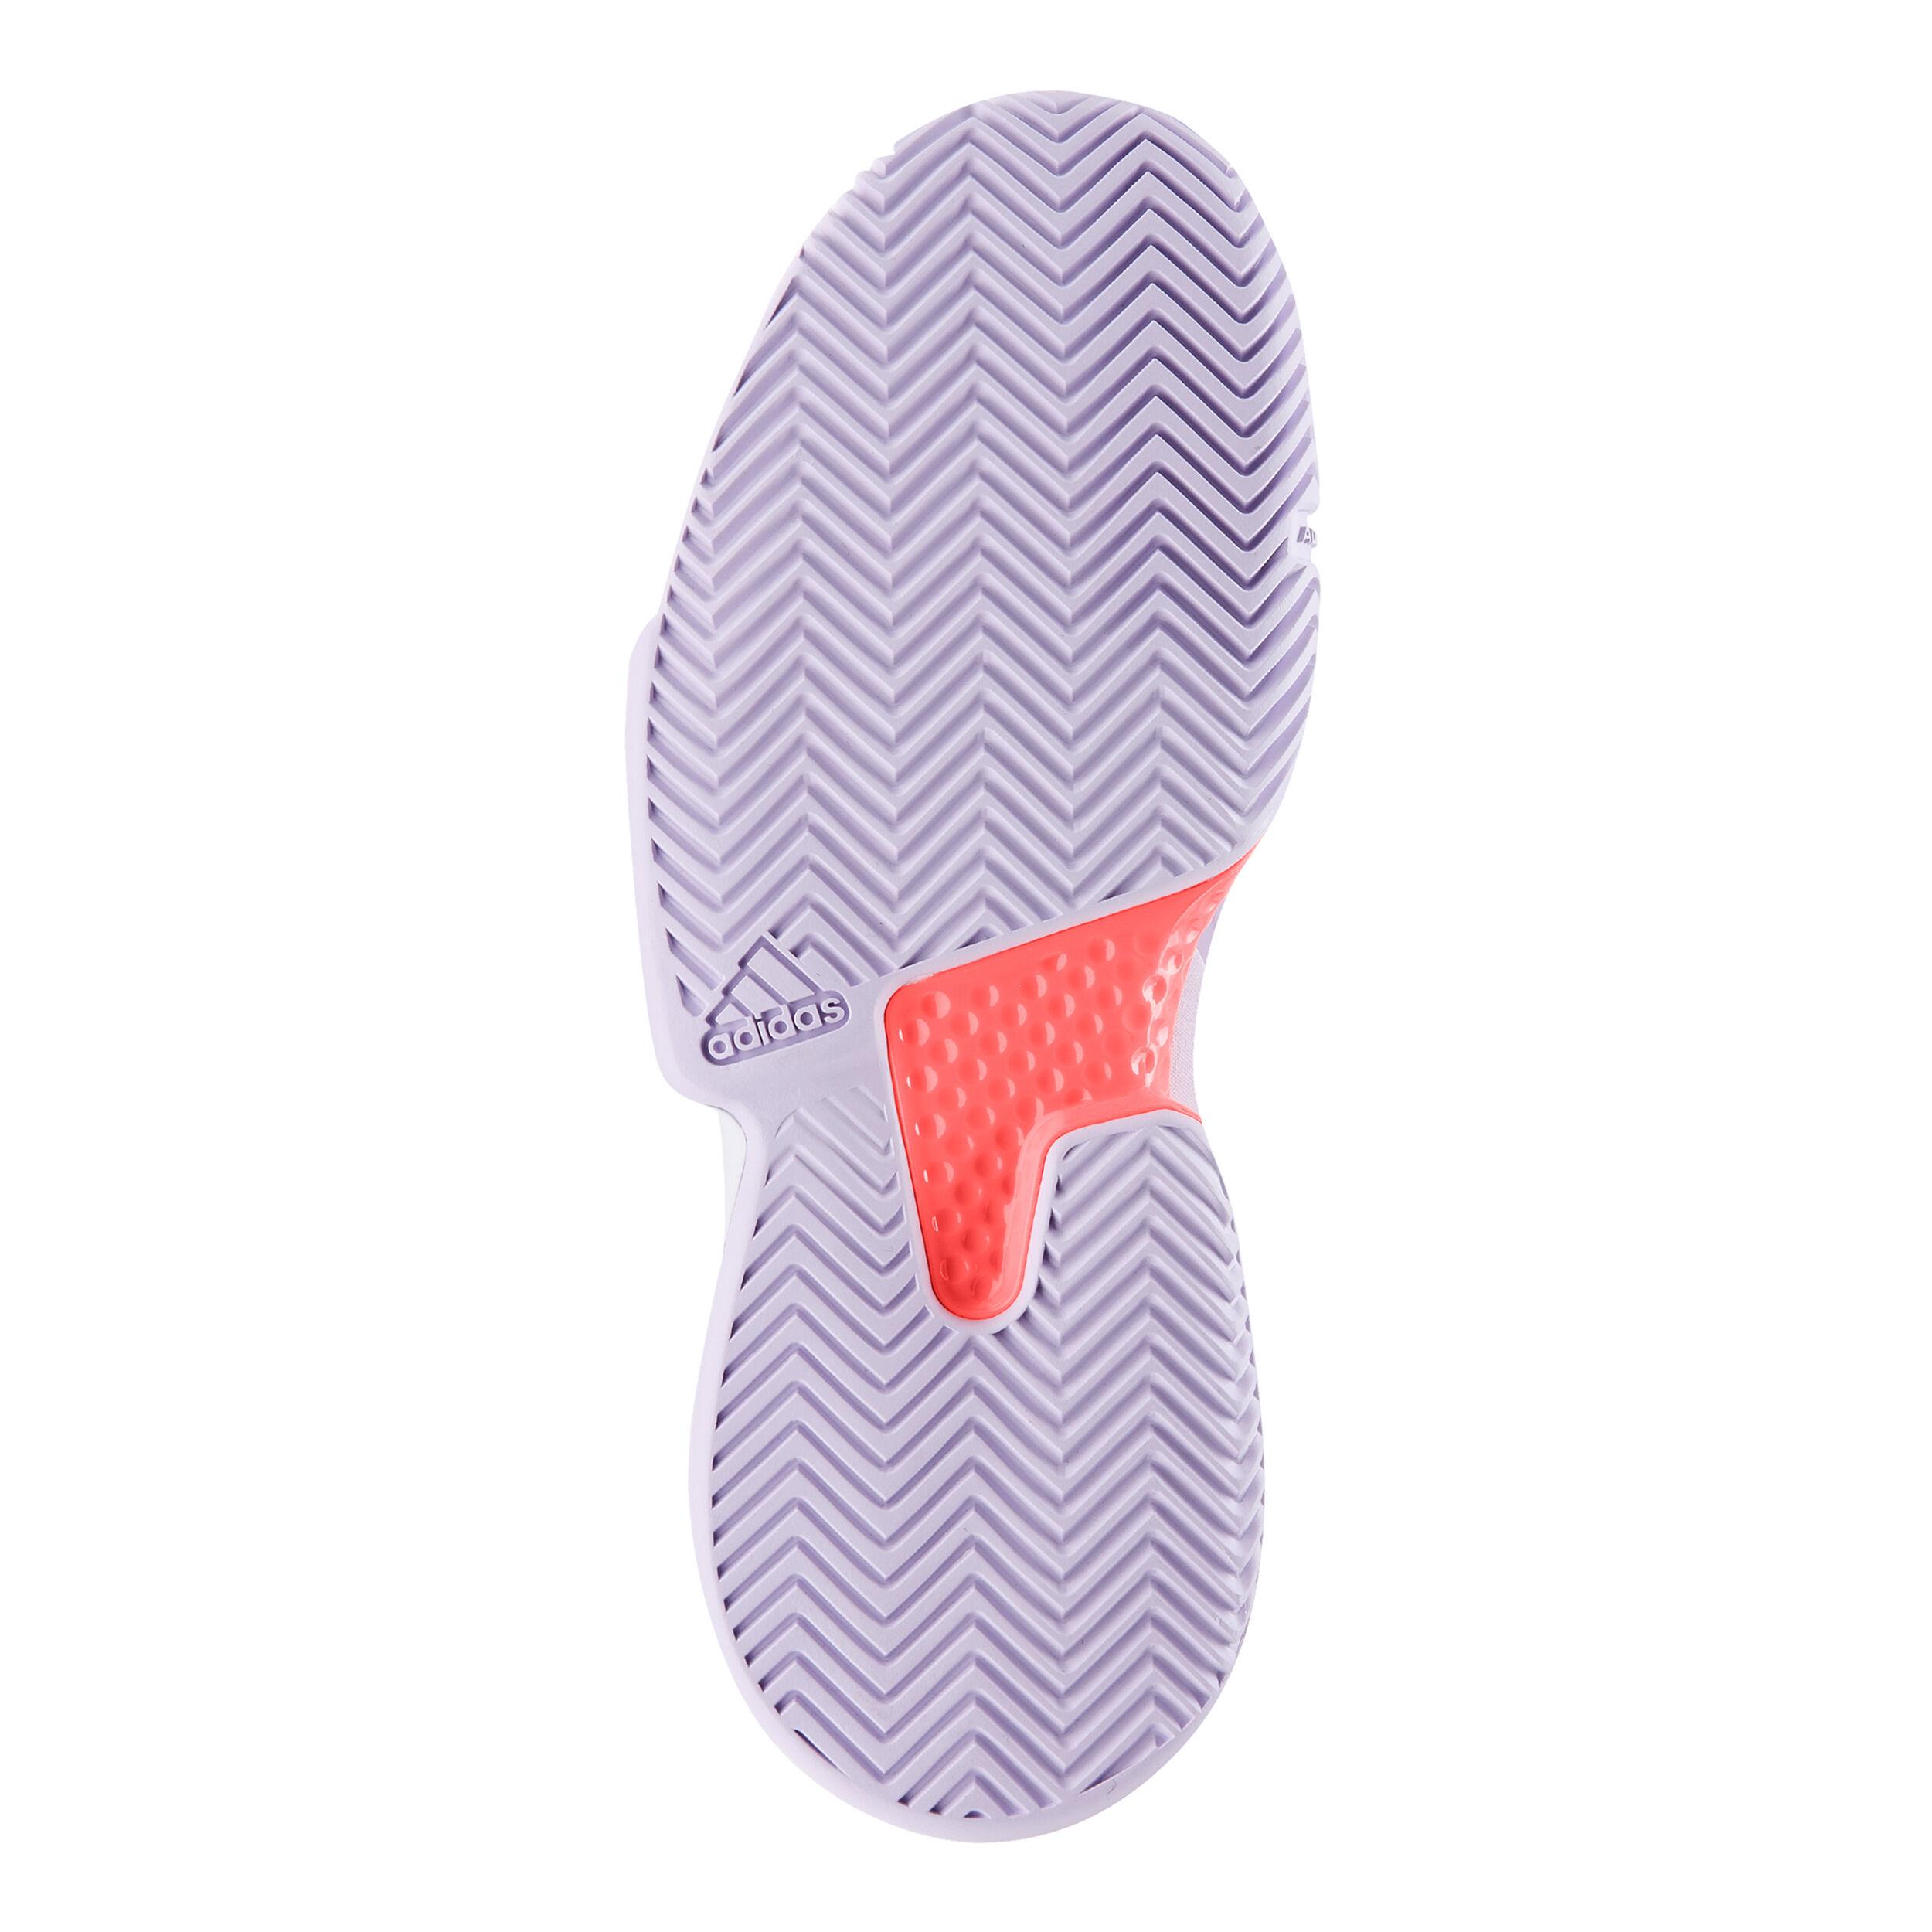 adidas Sole Match Bounce Chaussures Toutes Surfaces Femmes